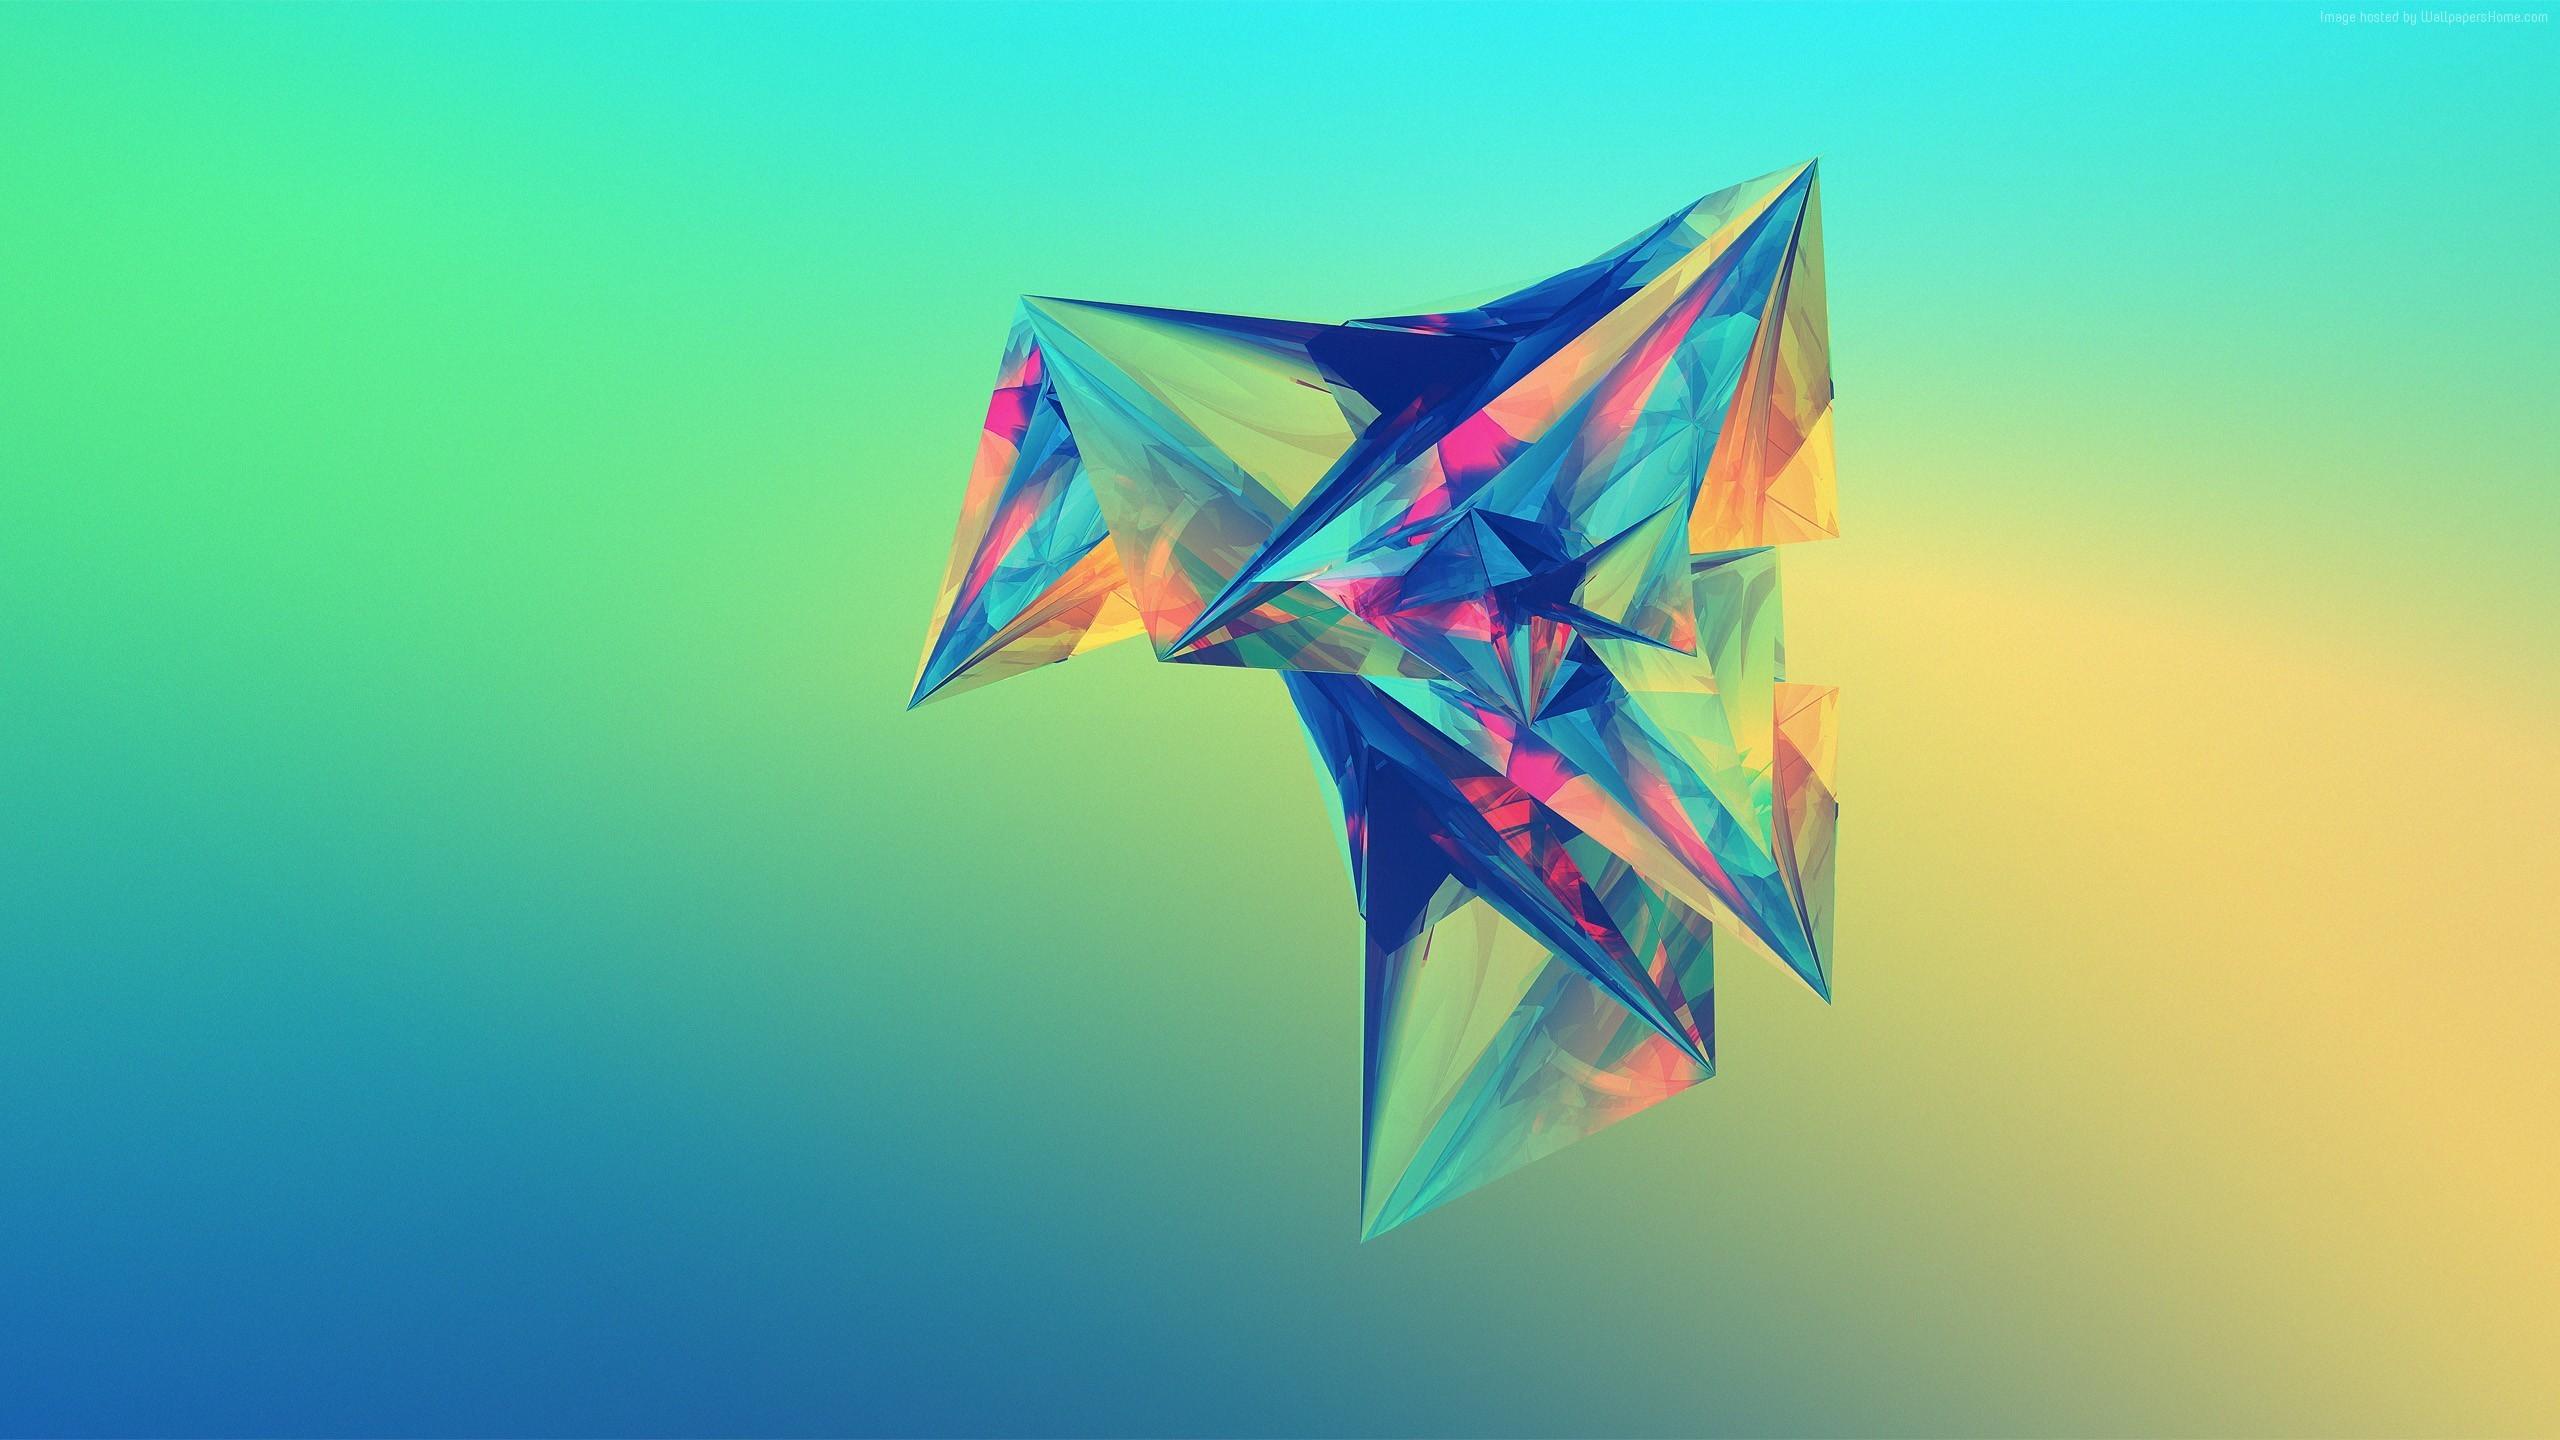 Wallpaper polygon, 4k, HD wallpaper, green, orange, blue, background,  Abstract #231